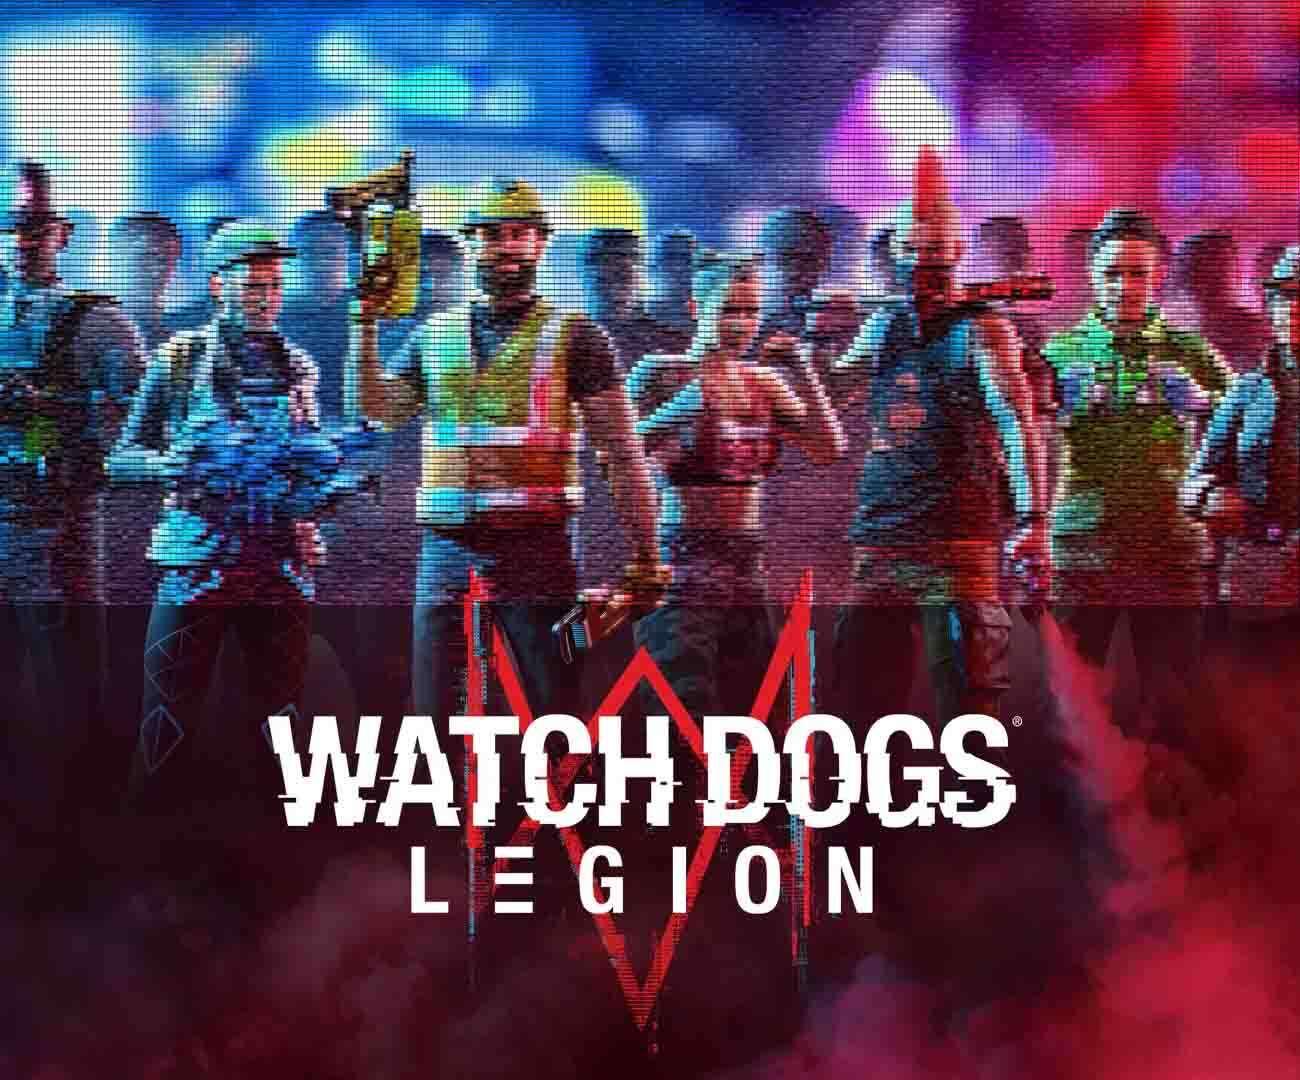 watch dogs legion, xbox series x